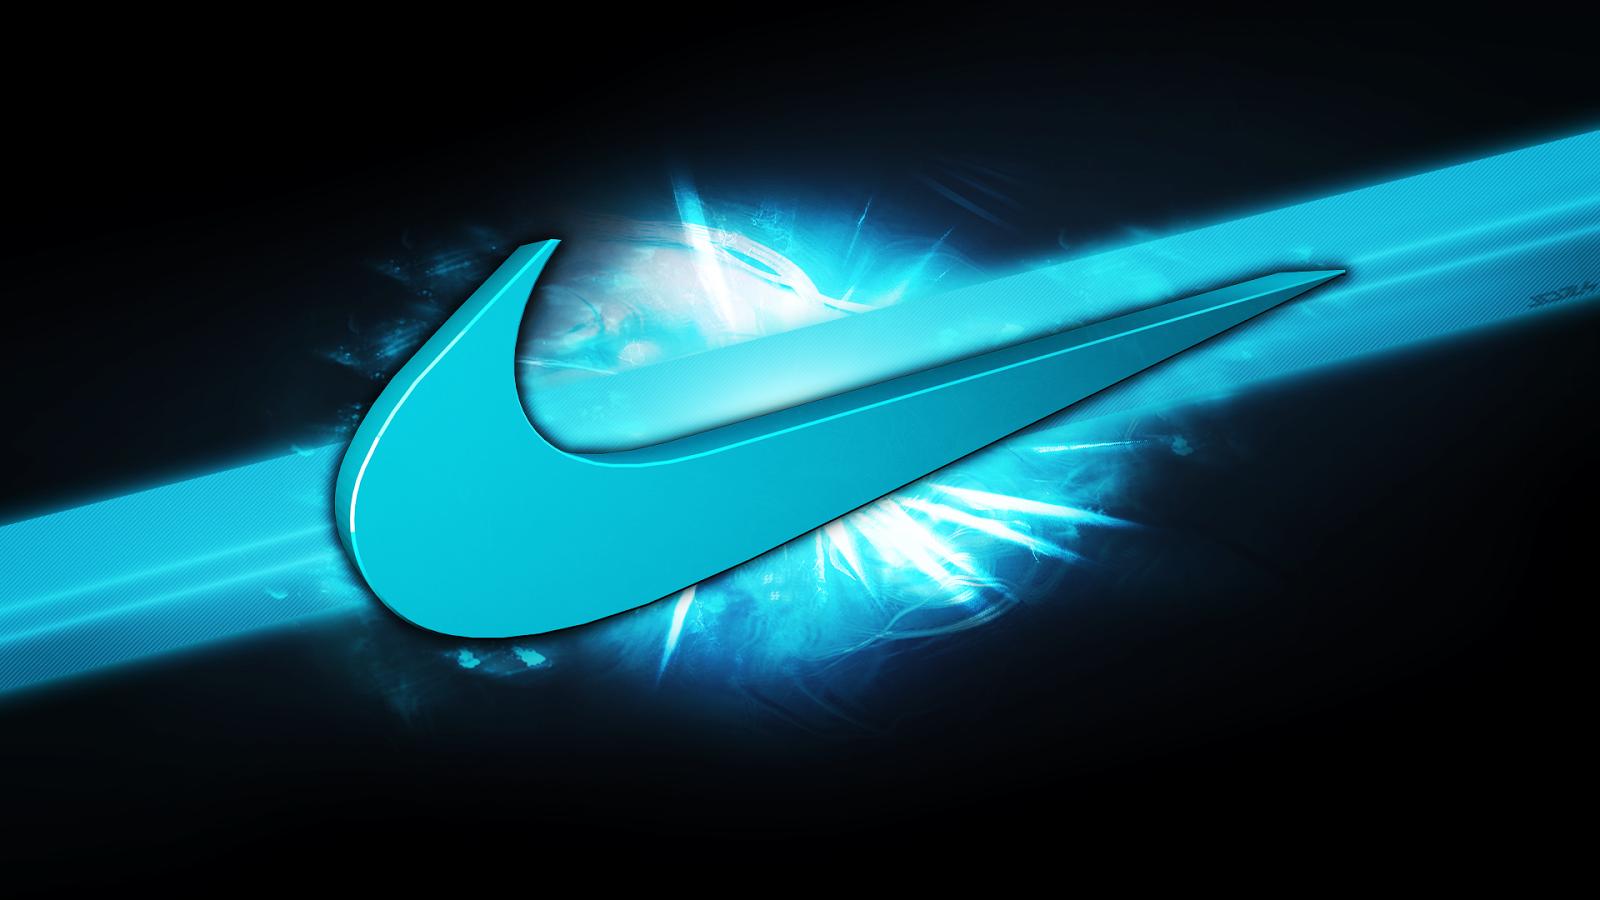 HD WAllppaers Nike HD Wallpaper 1080p 1600x900